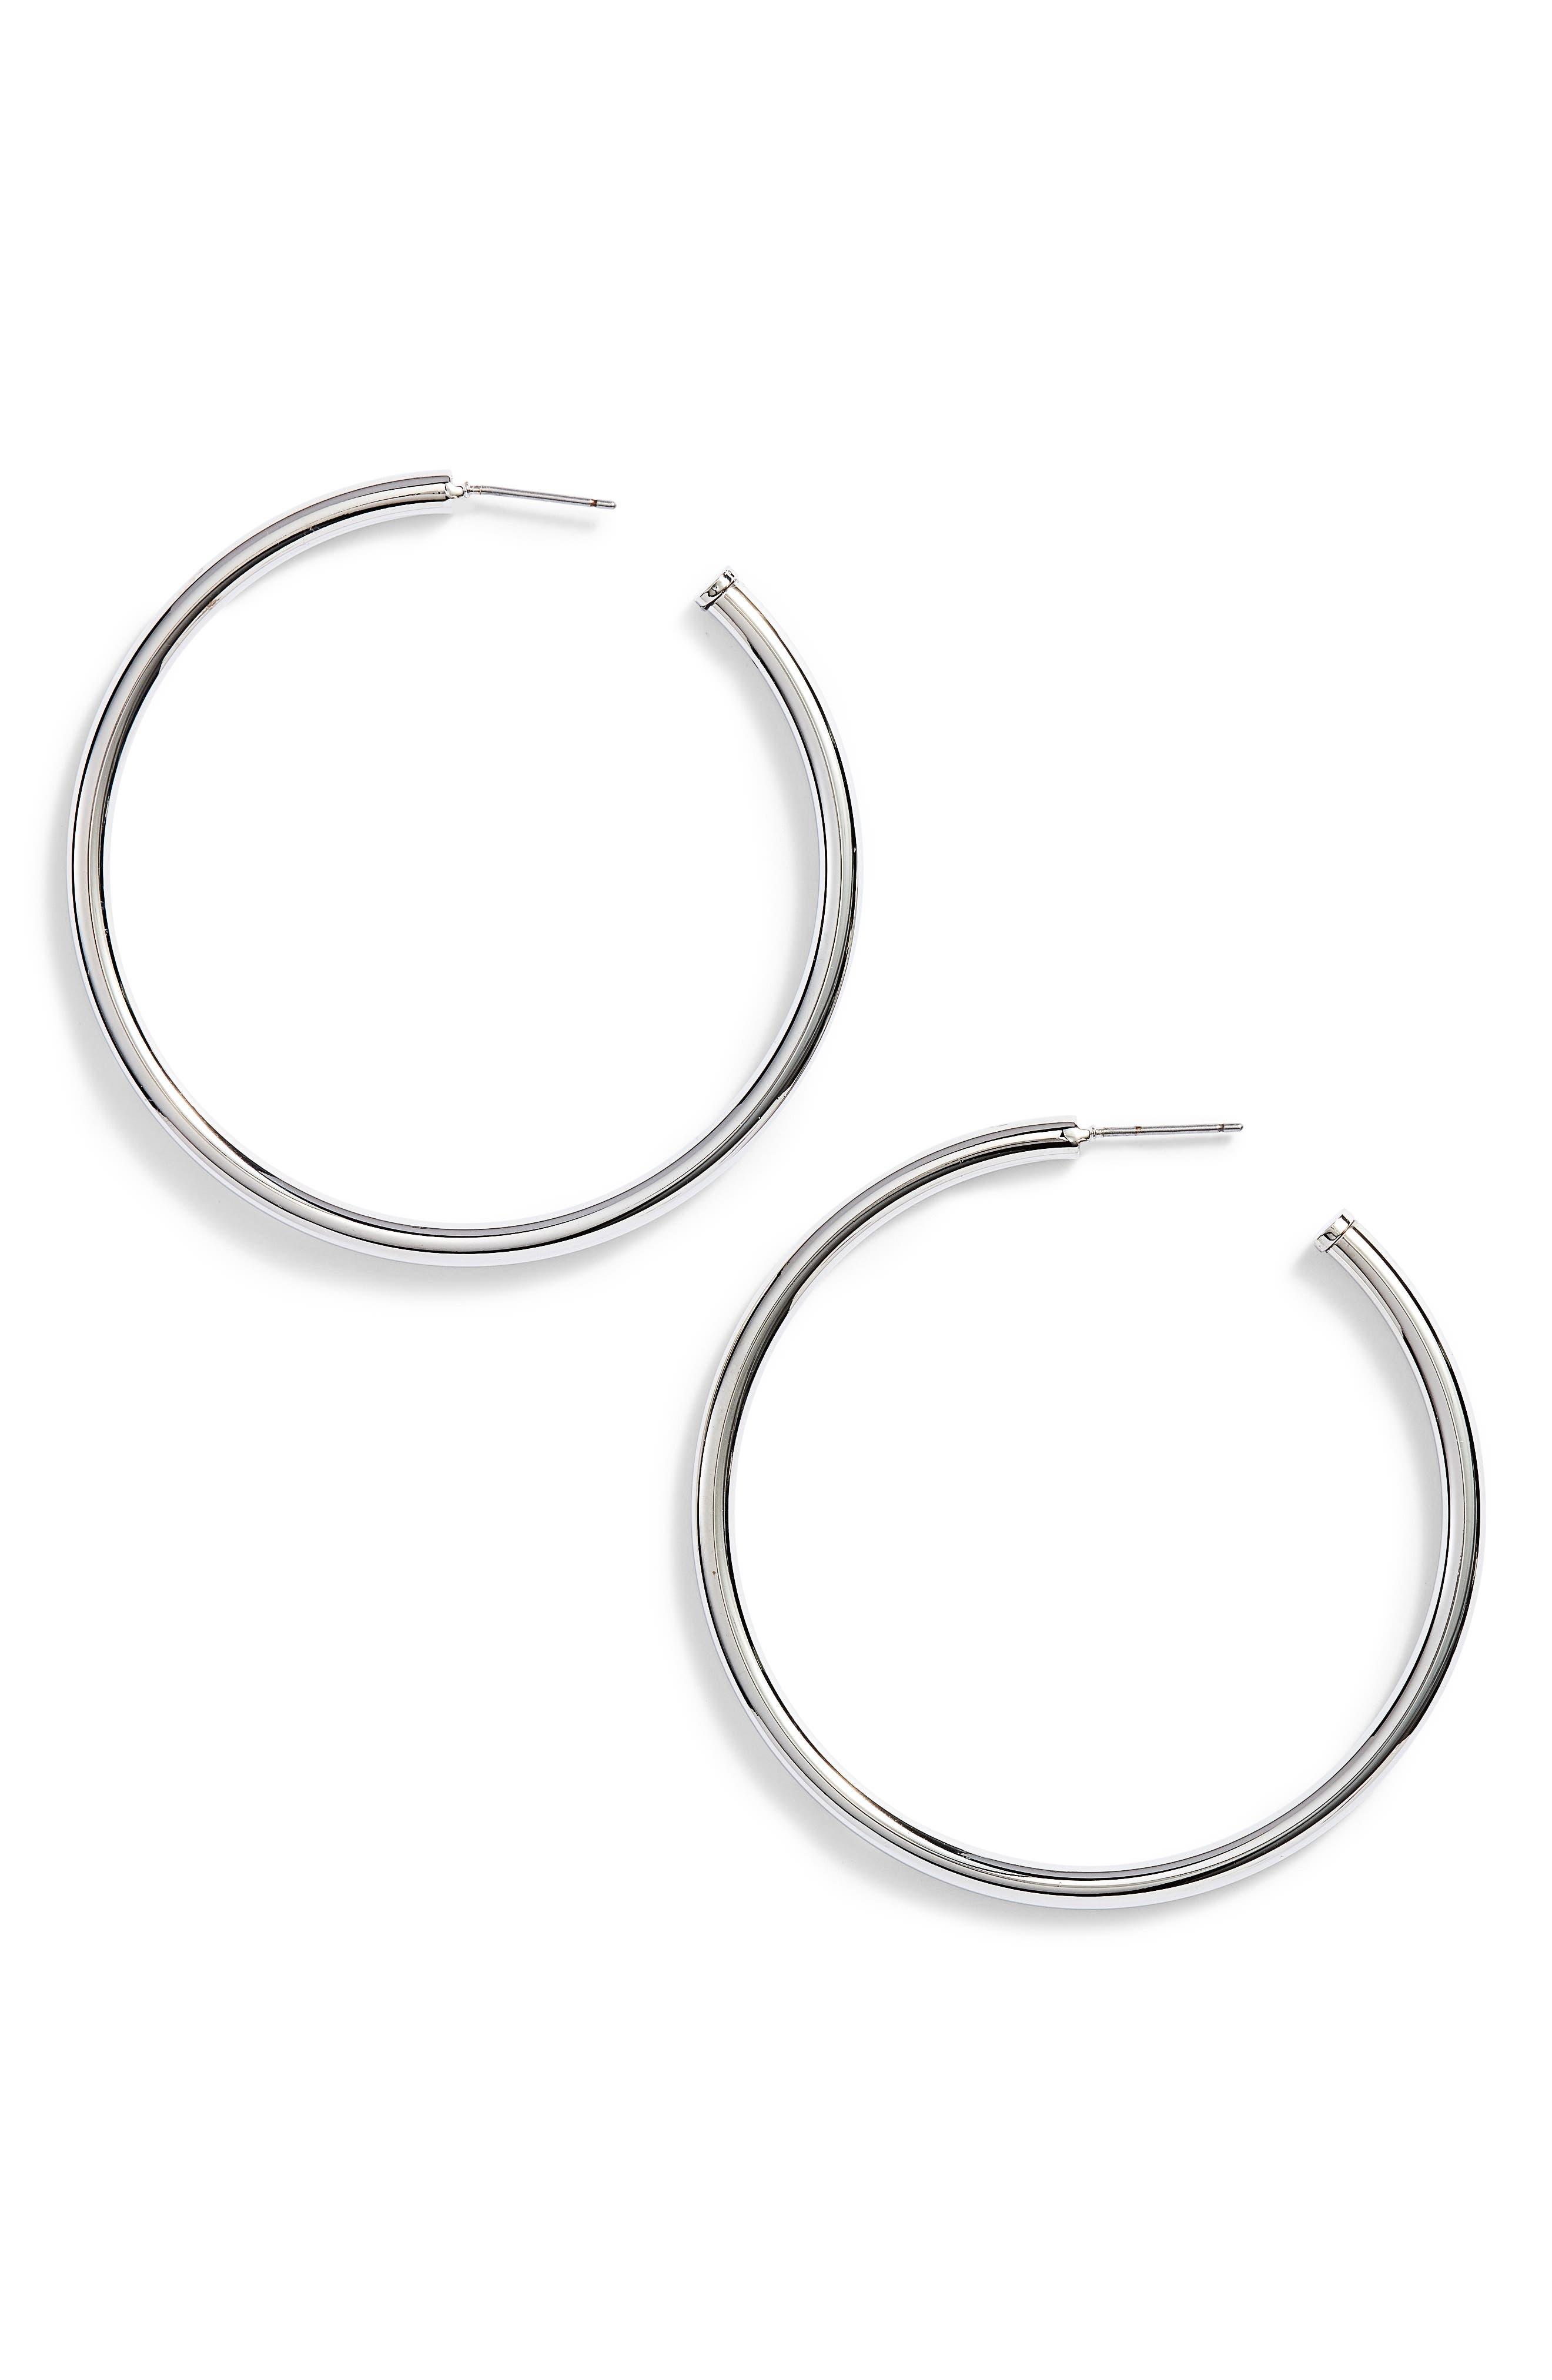 Rounded Tube Oversize Hoop Earrings,                             Main thumbnail 1, color,